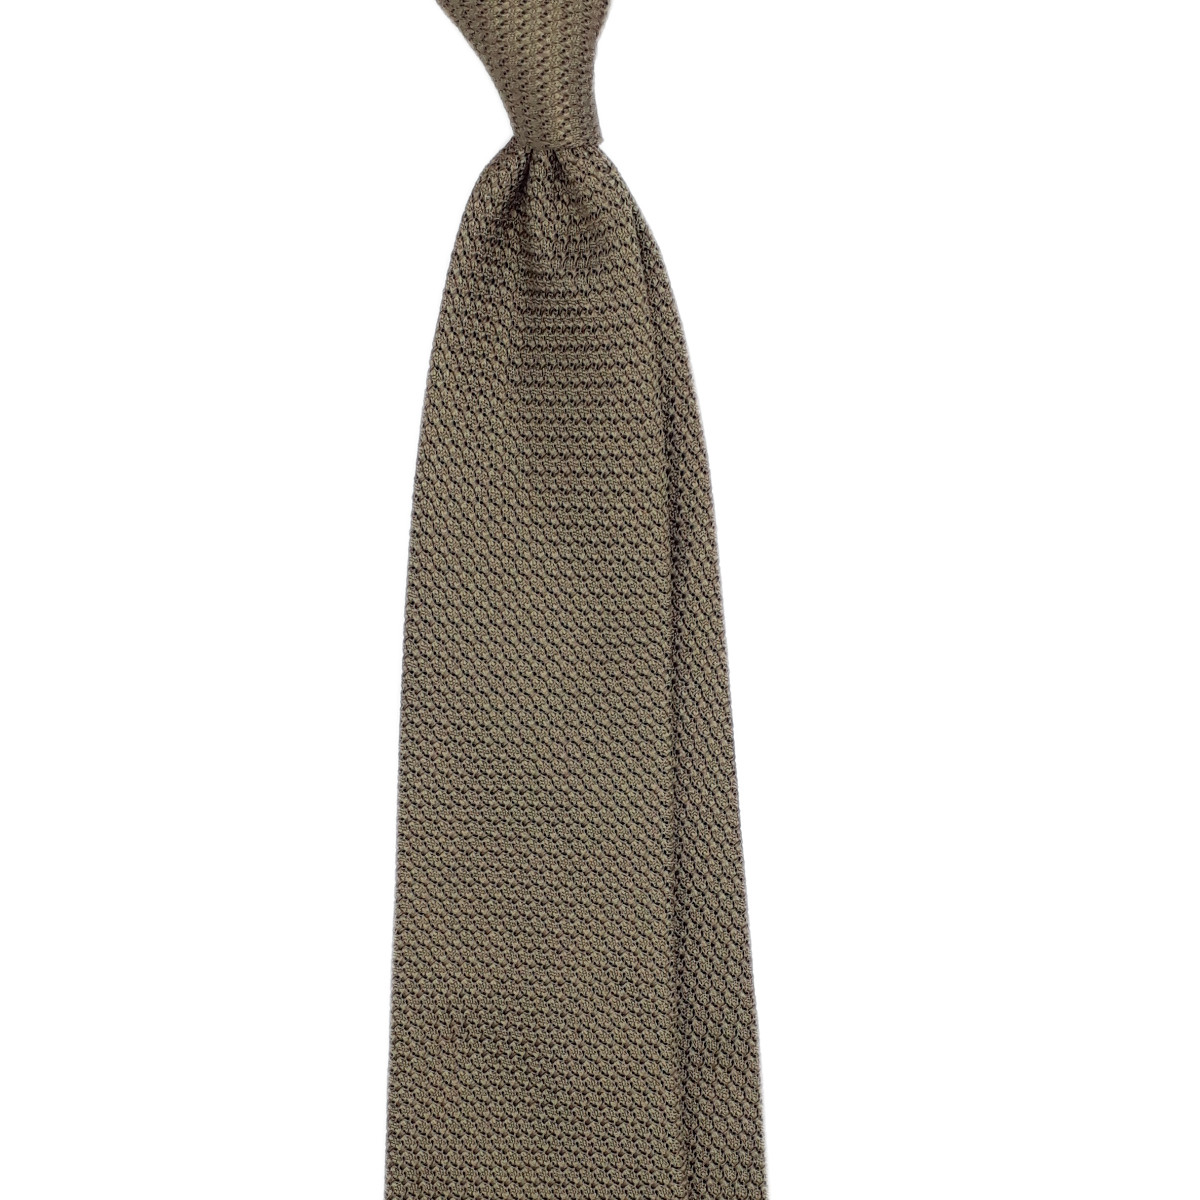 Cravatta khaki garza grossa